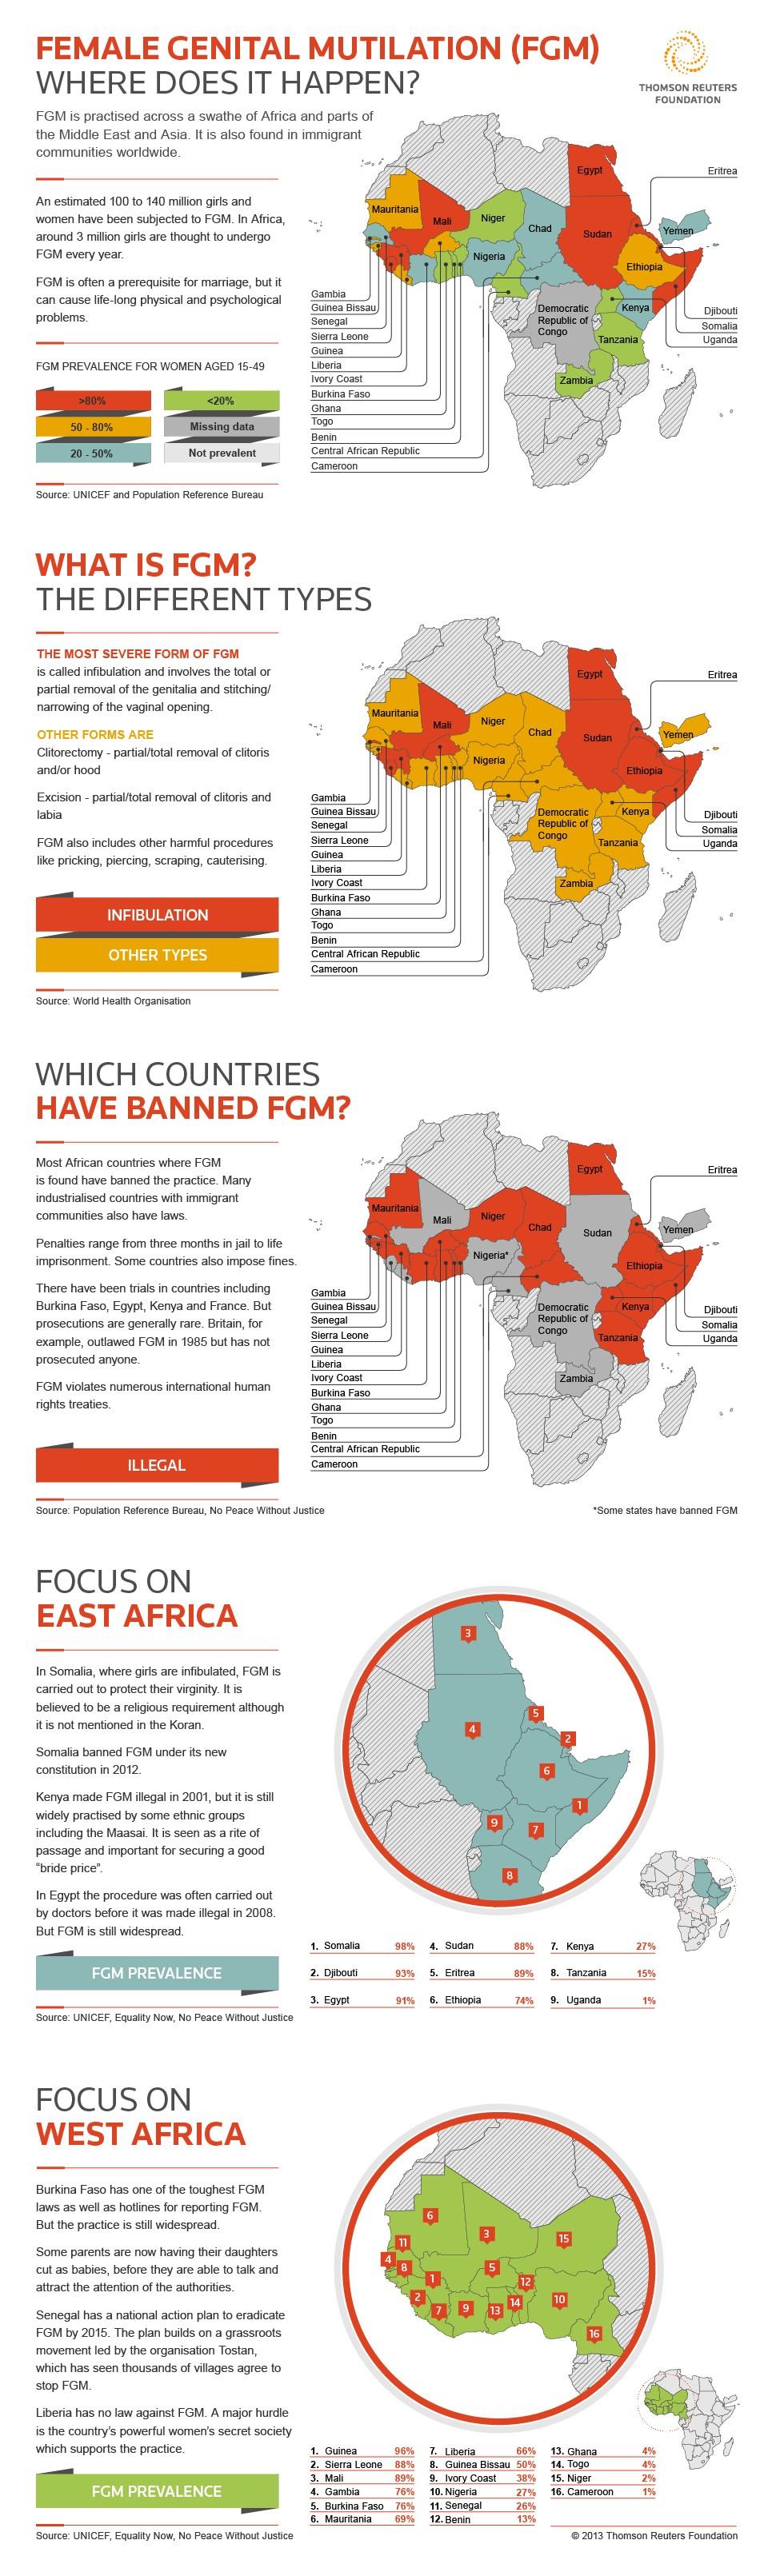 Female Genital Mutilation Infographic